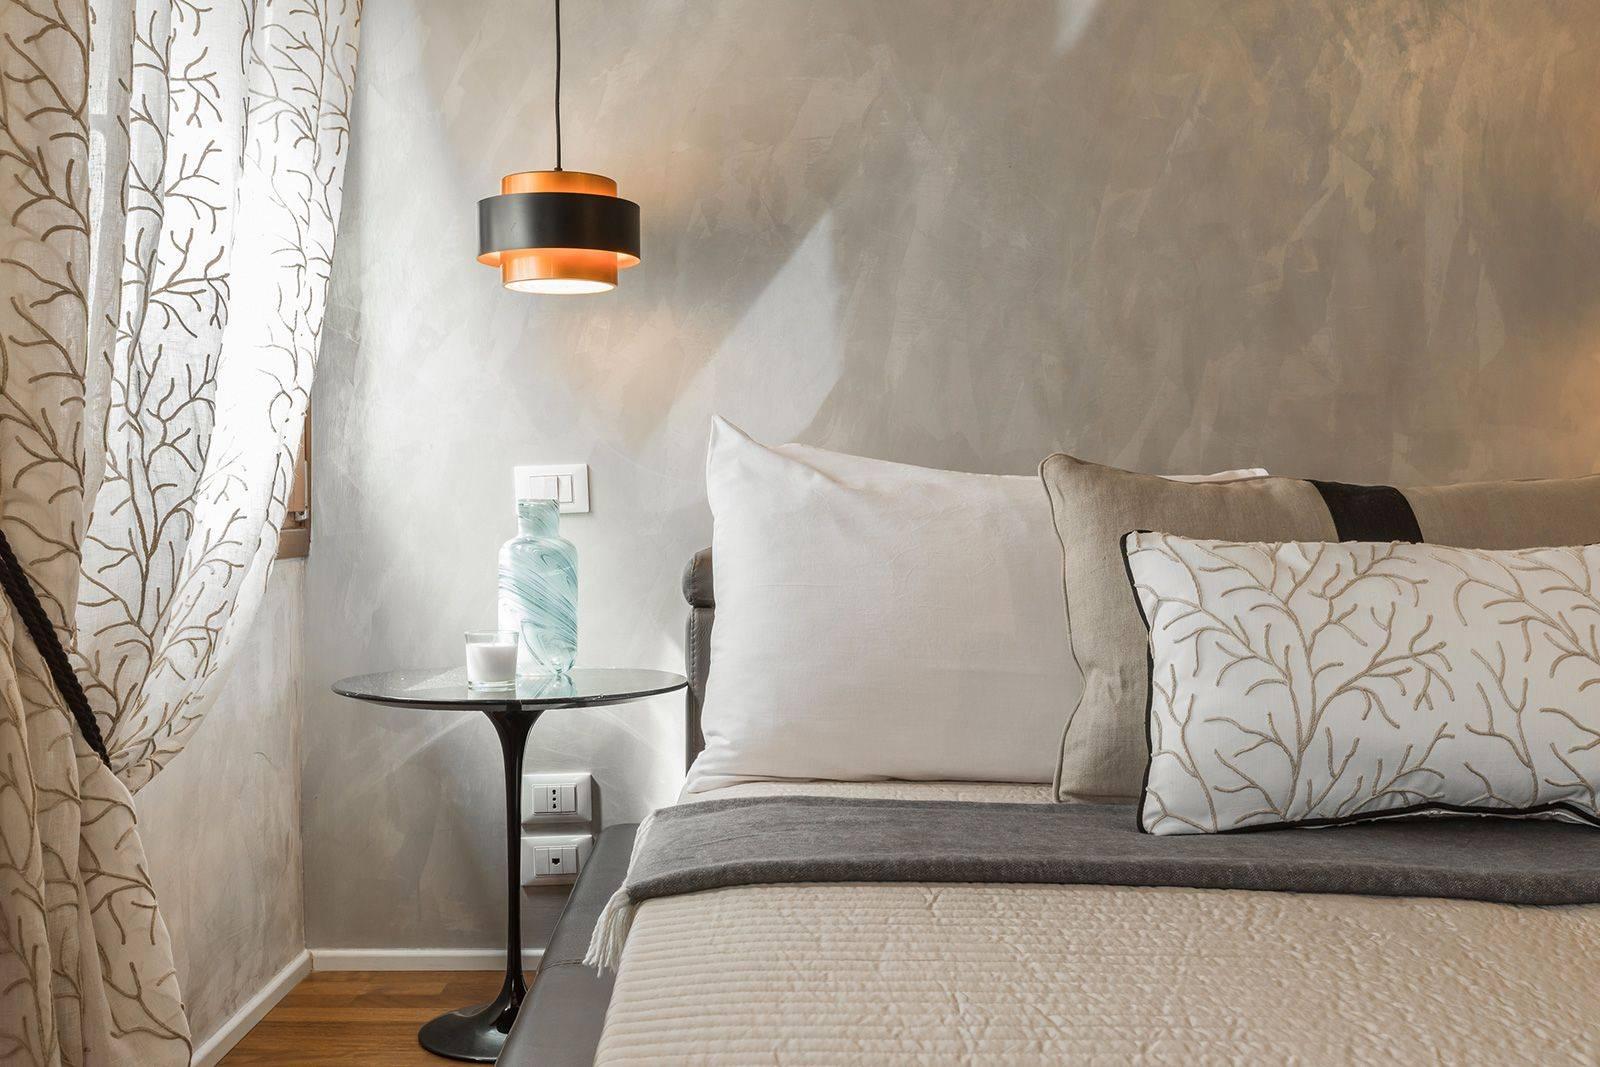 with nice fabrics and stucco Veneziano walls